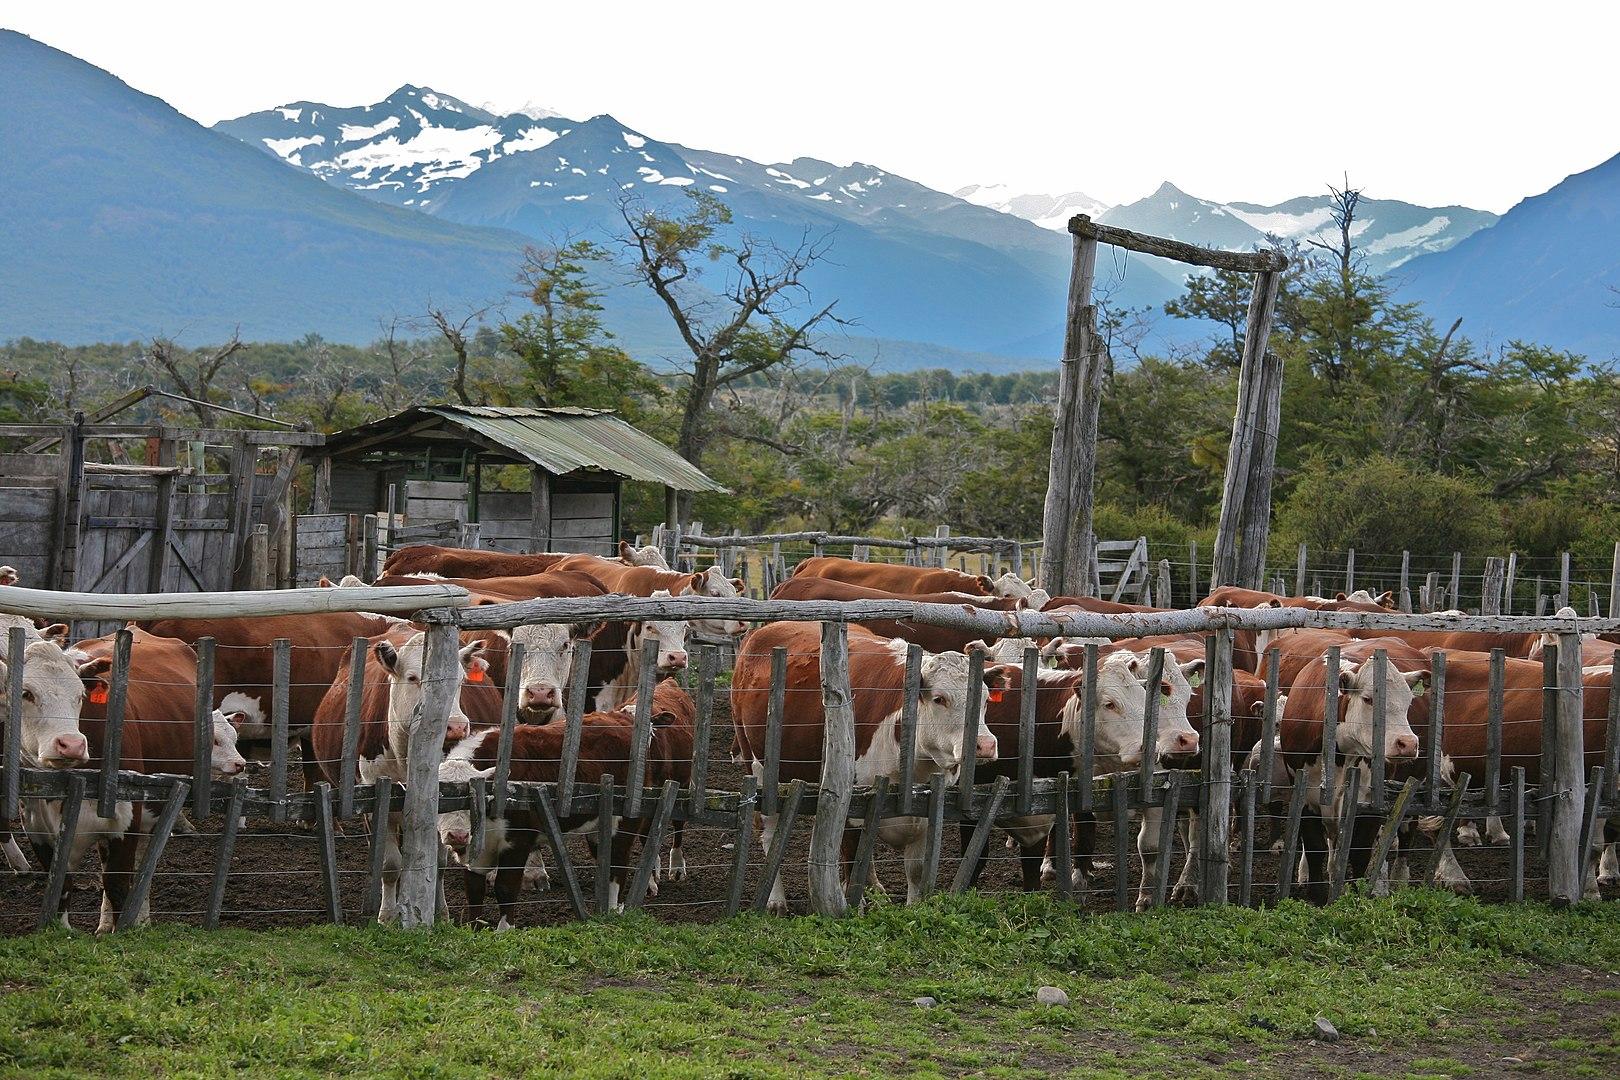 Rainforest Facts, Cattle Ranch